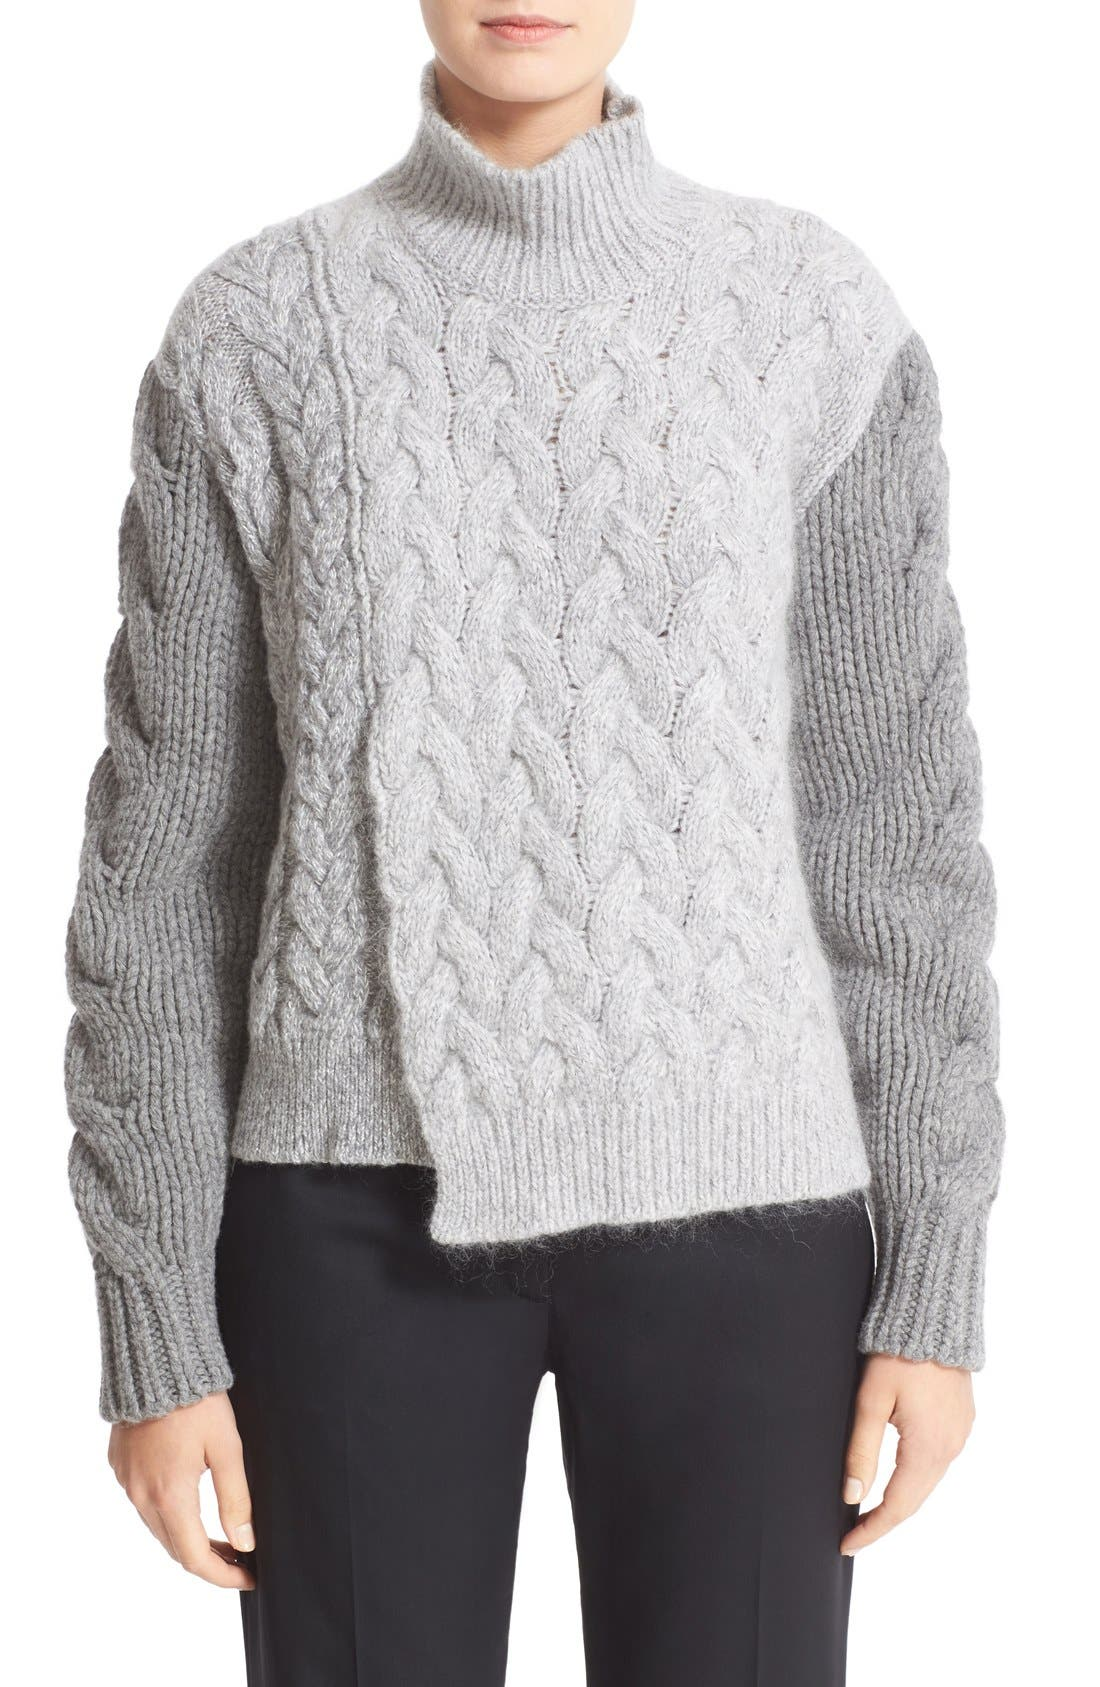 STELLA MCCARTNEY Mixed Media Turtleneck Sweater, Main, color, 120